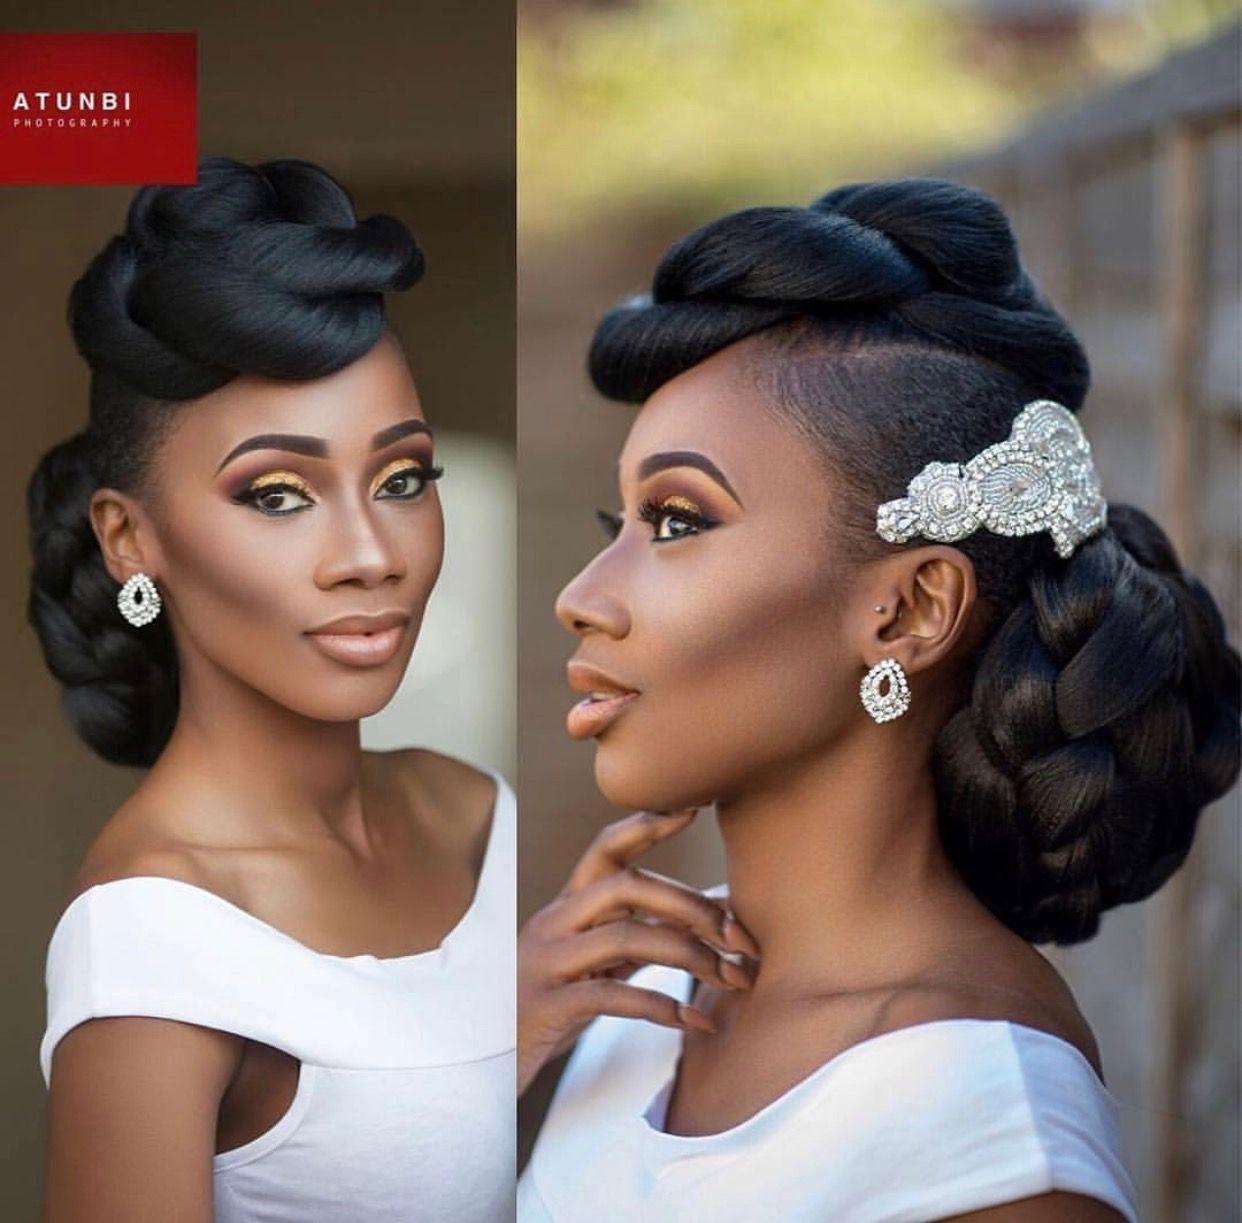 Pin By Yasmine Ahmed On Black Bride Pinterest Hair